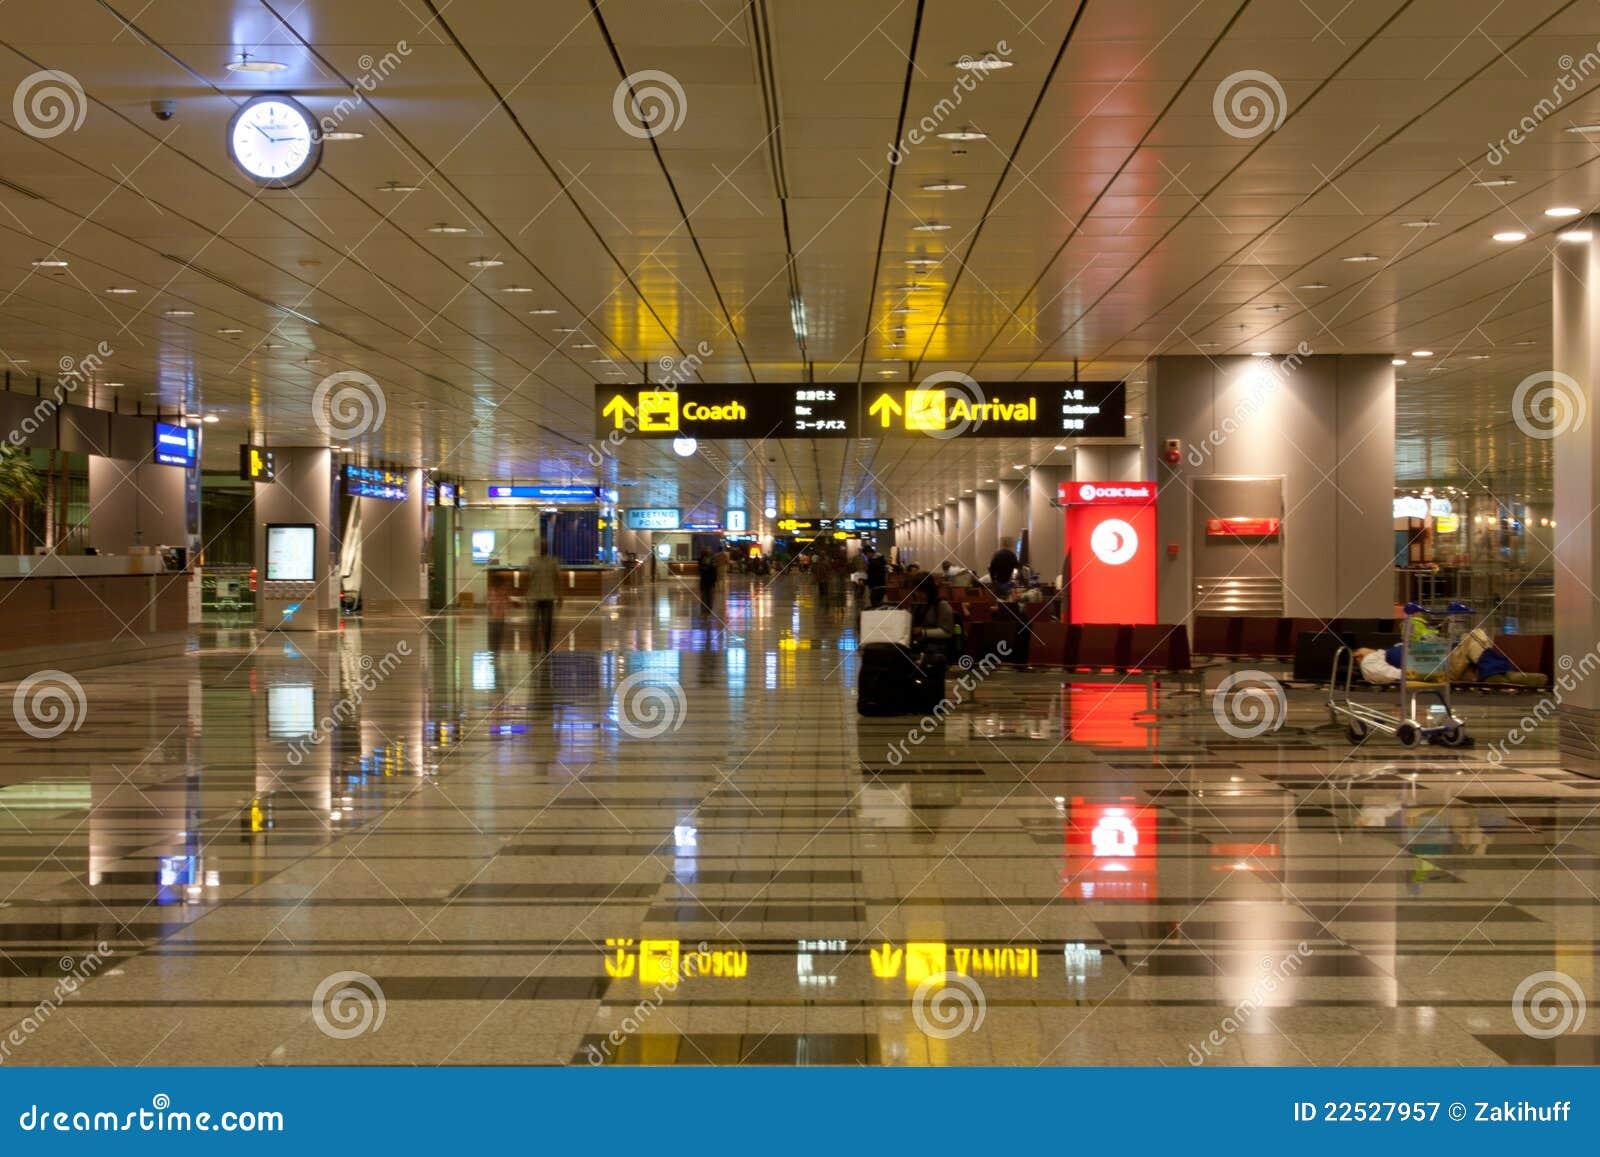 机场到达changi大厅新加坡